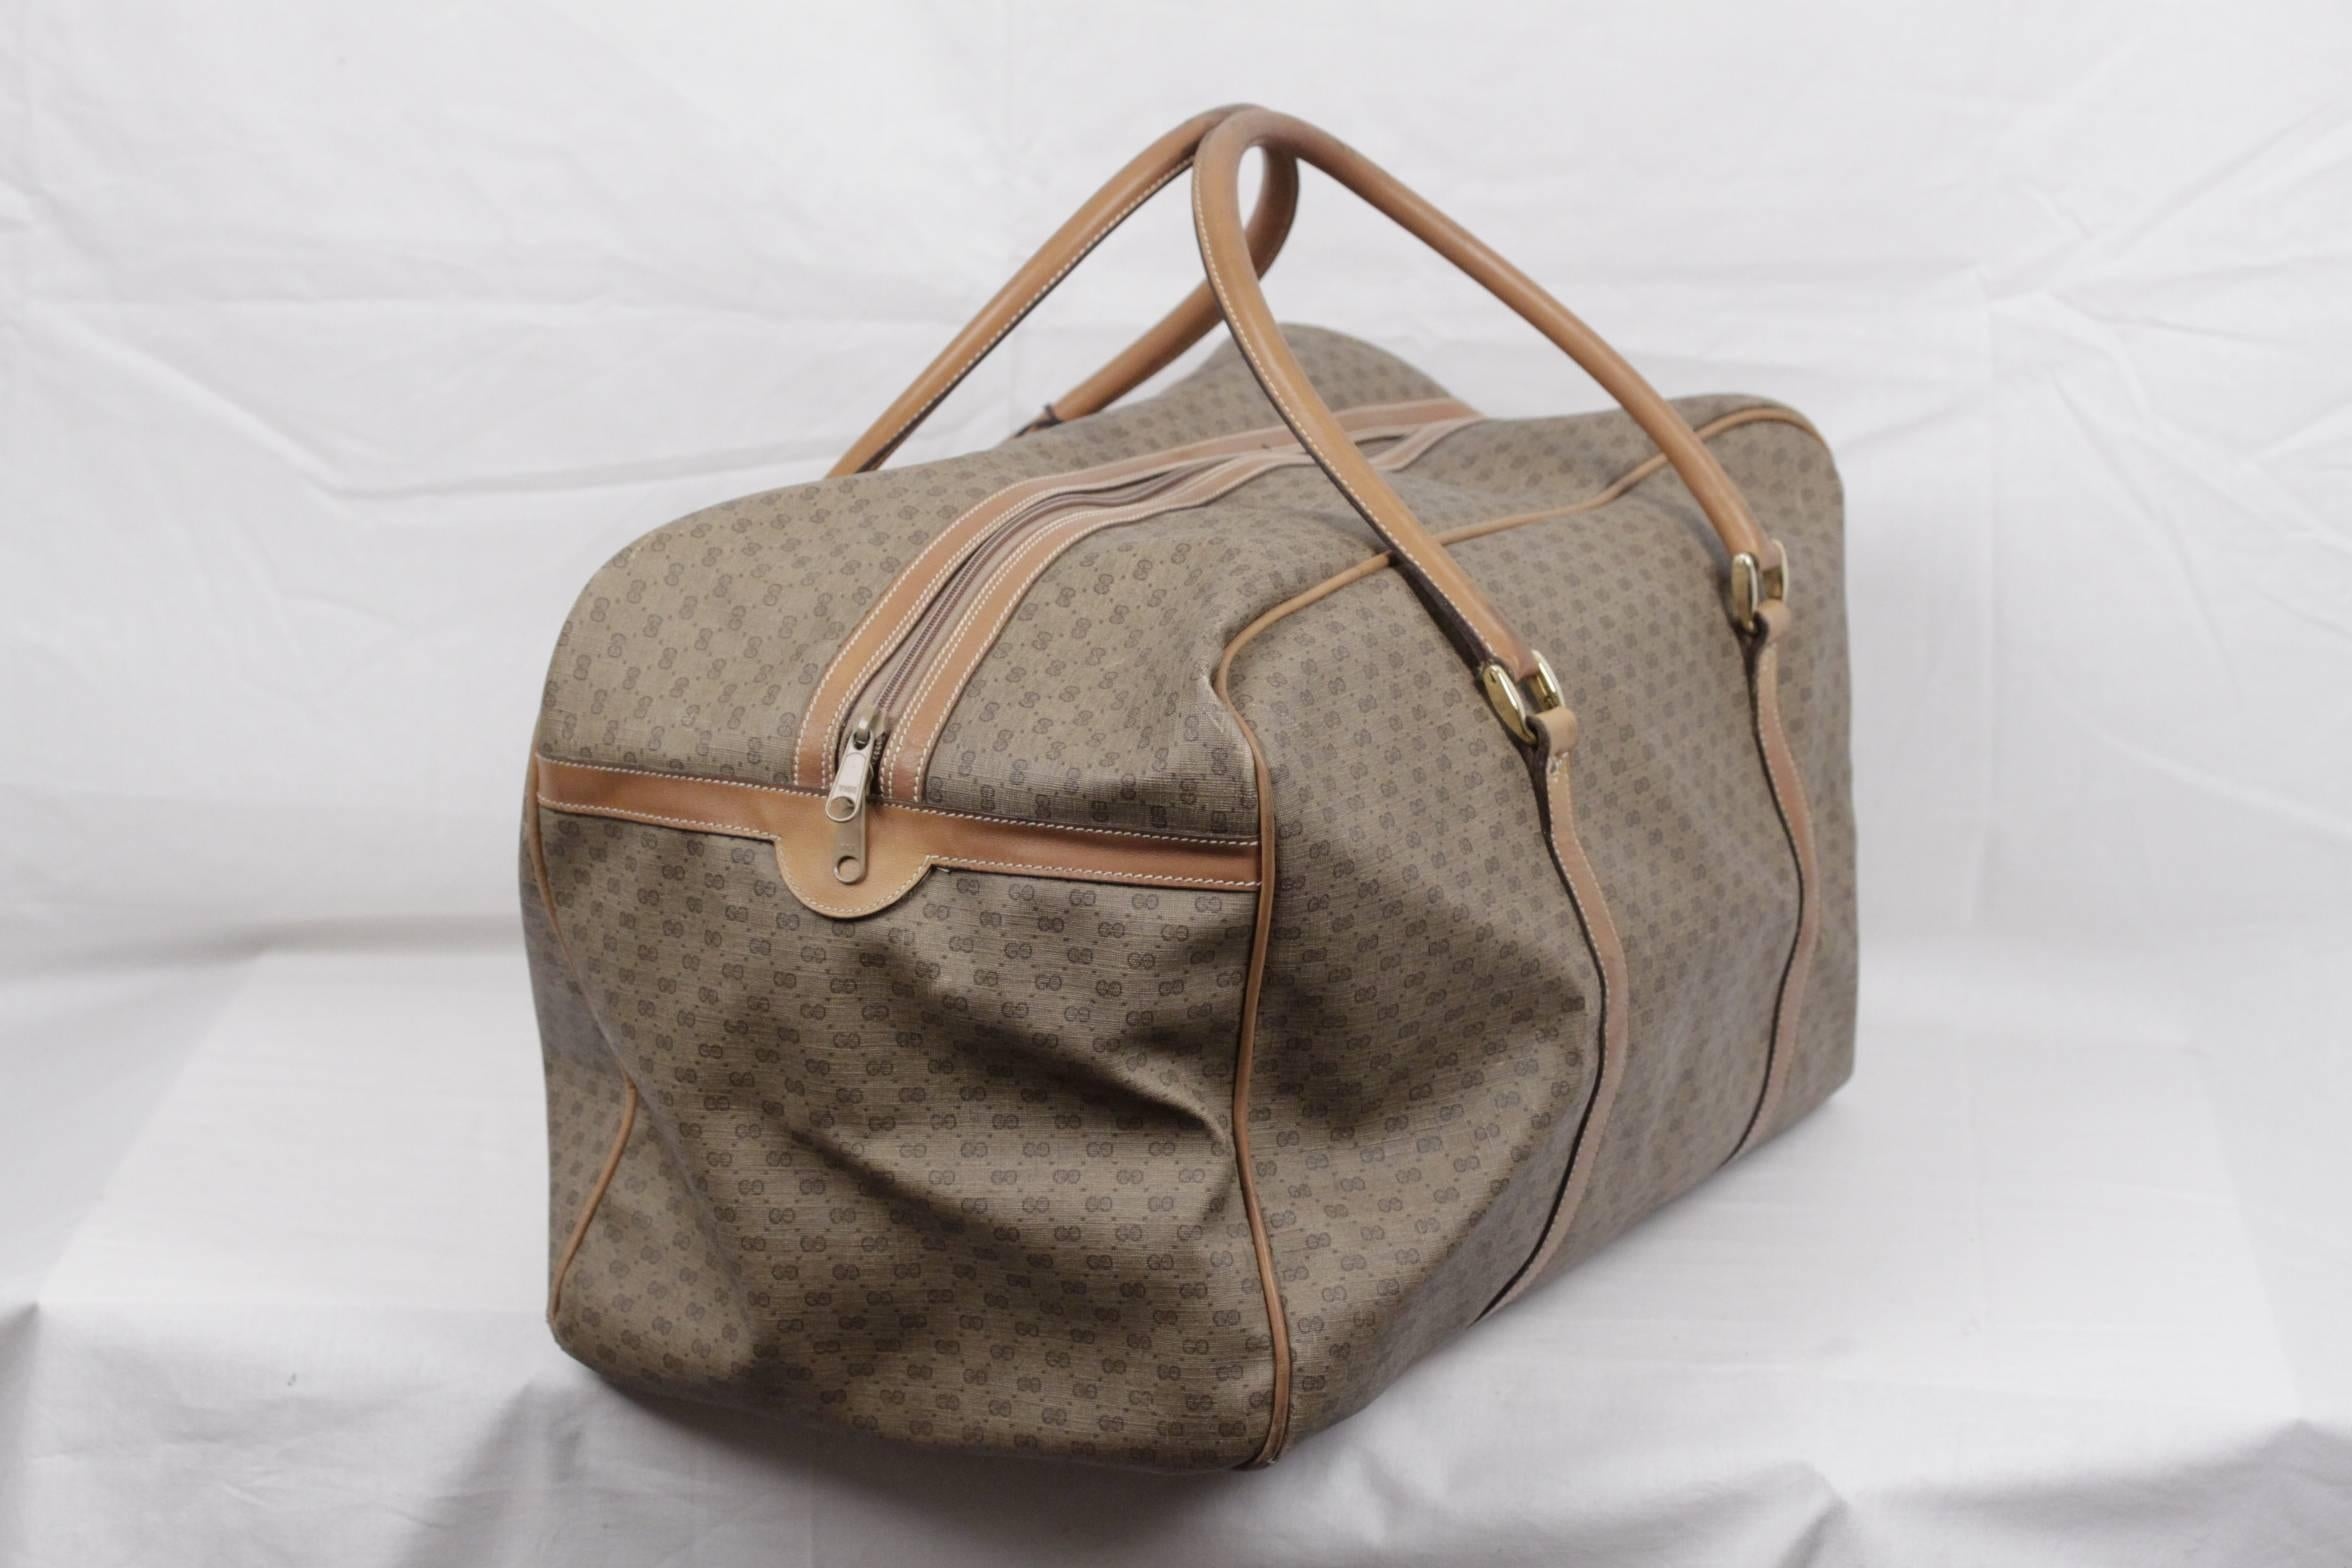 81d33262eea GUCCI Vintage Tan GG MONOGRAM Canvas WEEKENDER Travel Bag at 1stdibs